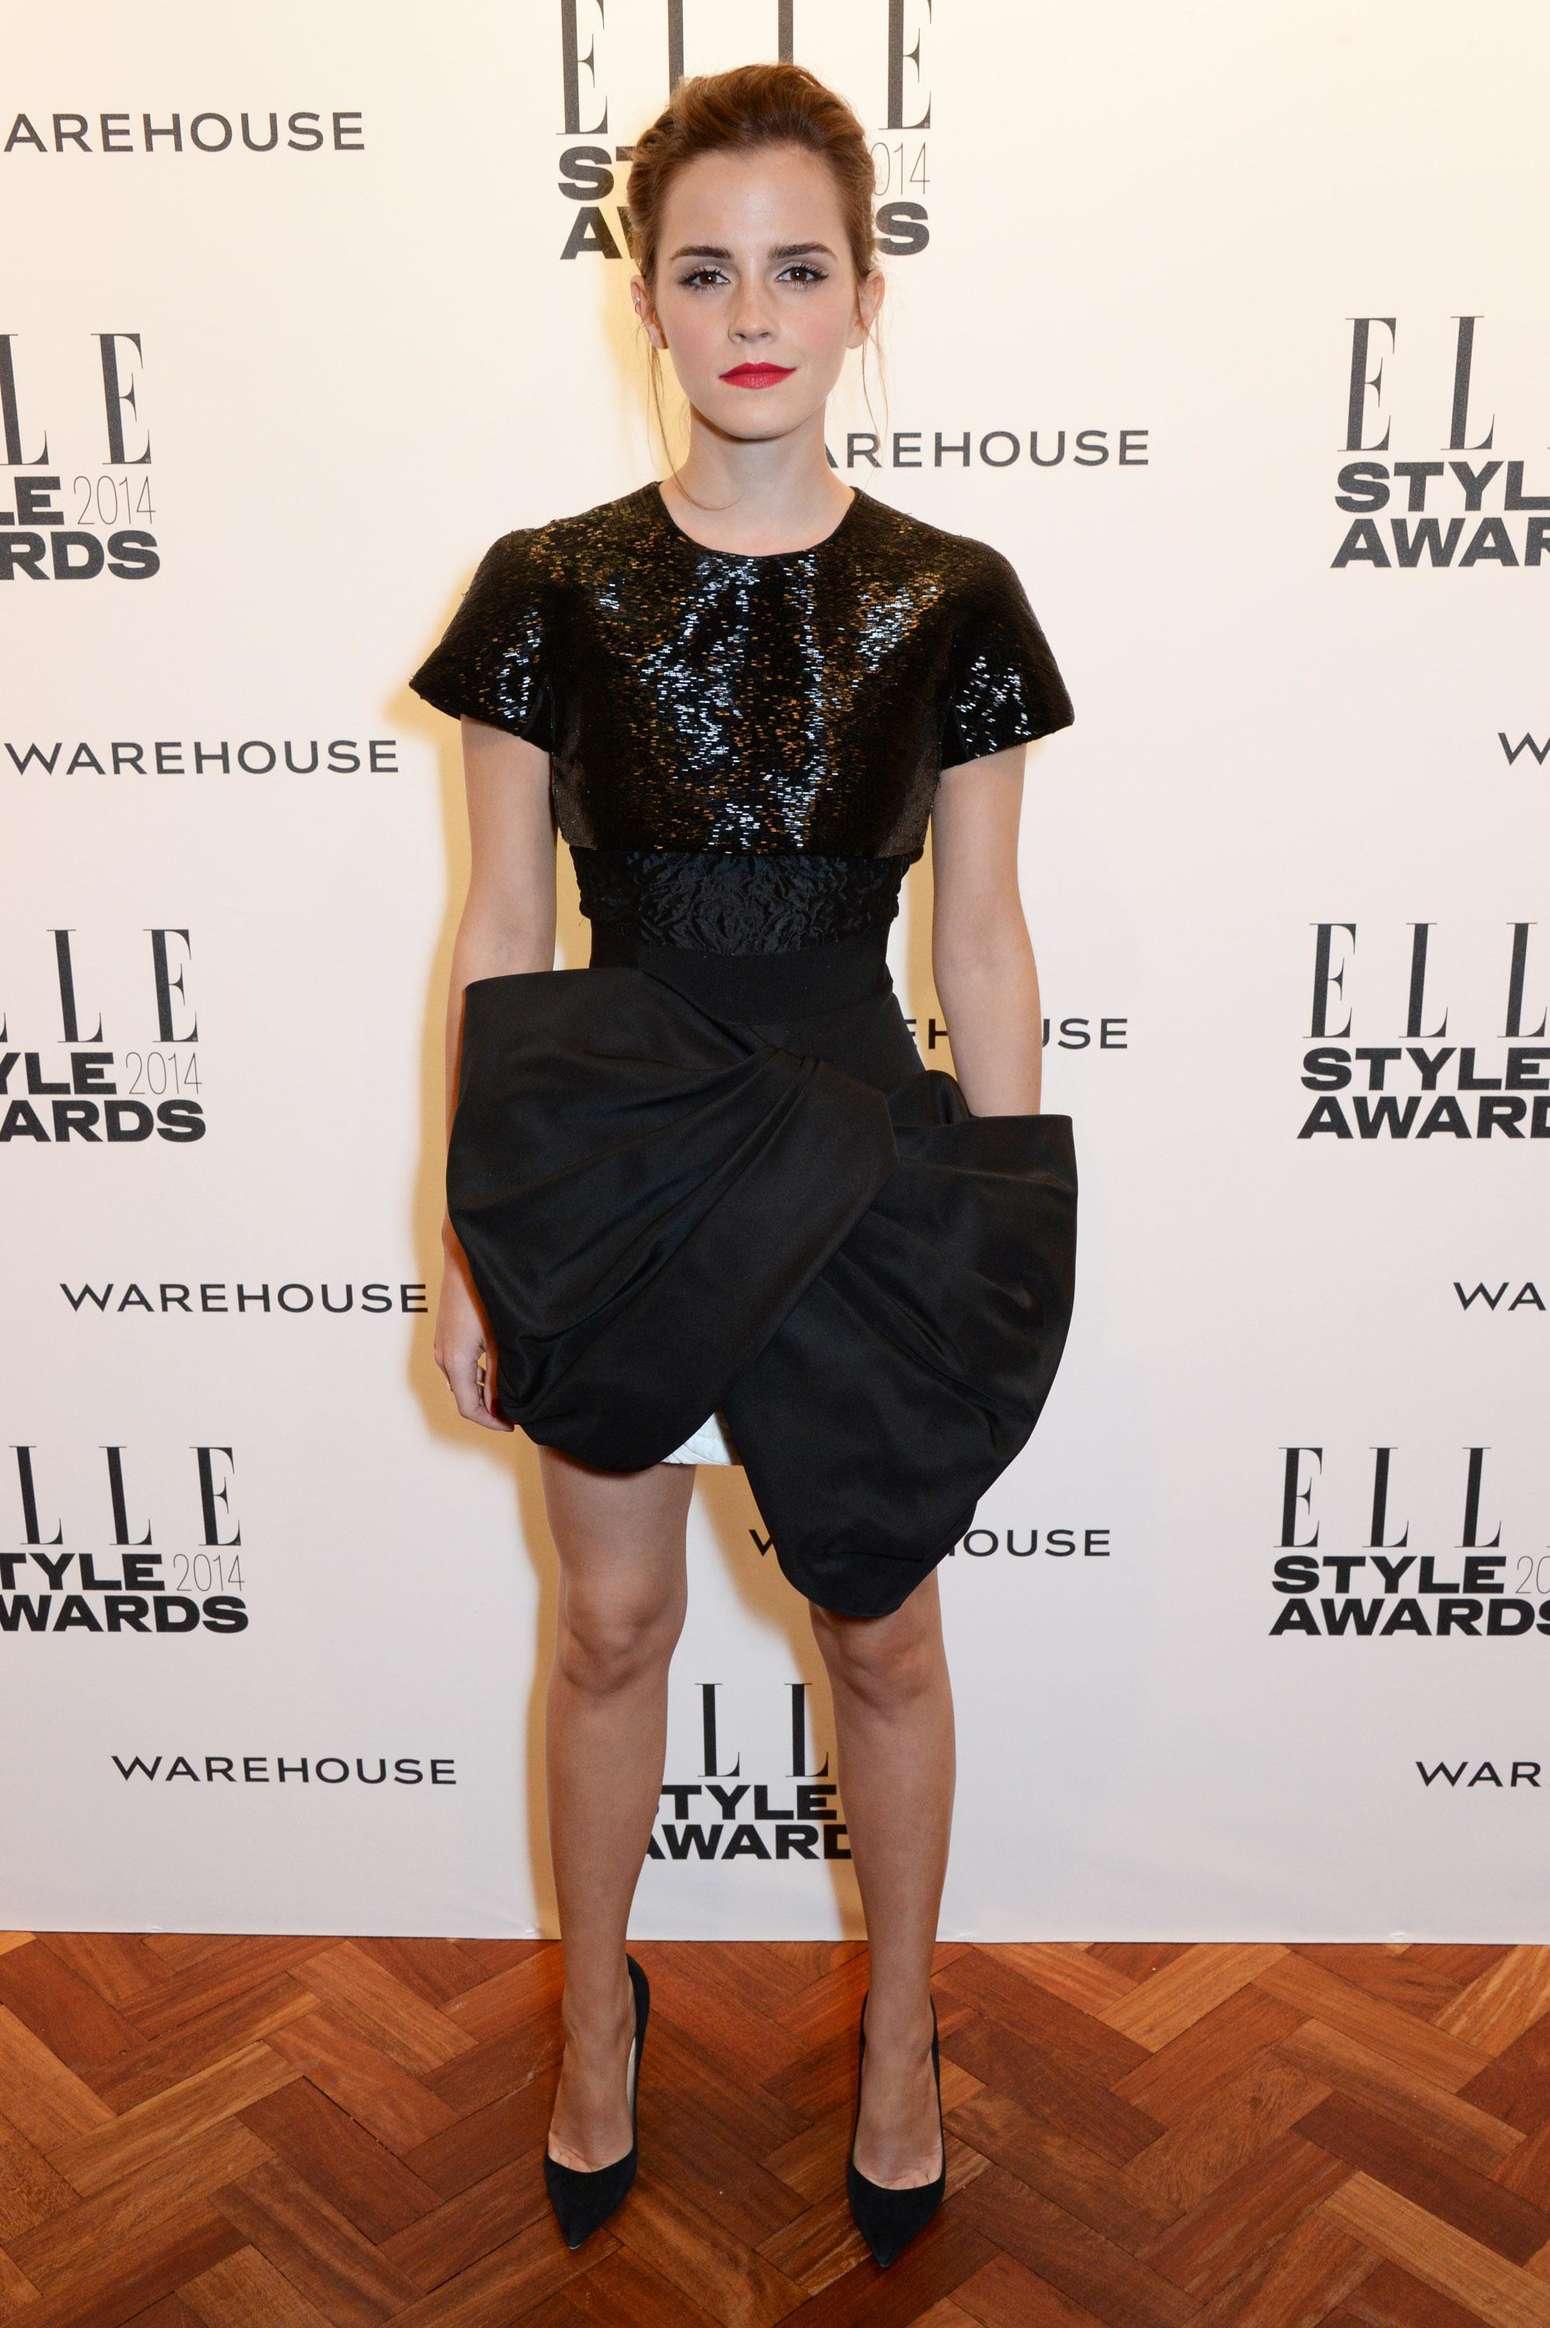 Emma Watson Elle 2014 Style Awards 10 Gotceleb